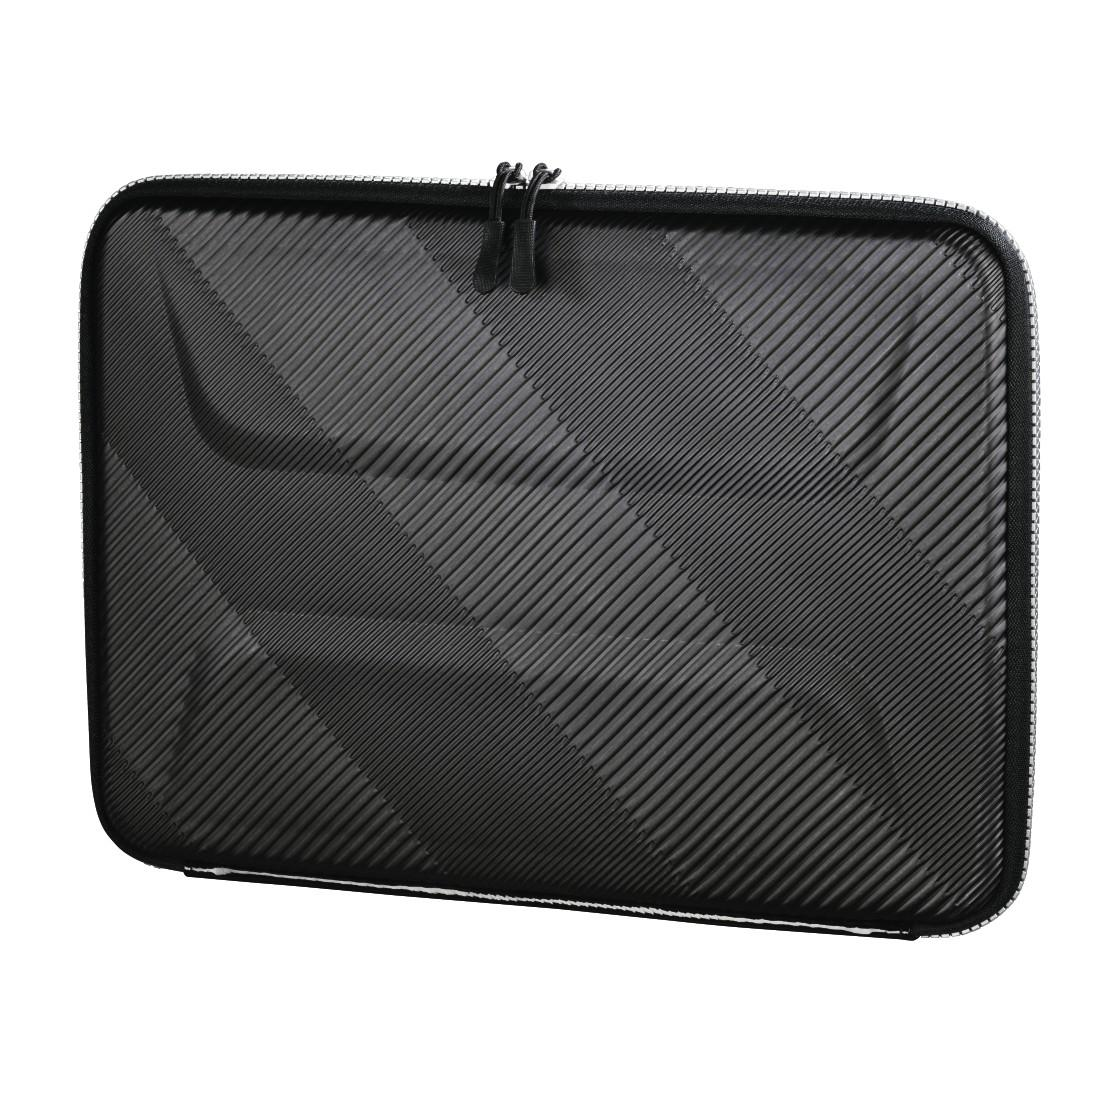 "Универсален калъф за лаптоп HAMA Protection, до 34 см  (13.3""),  удароустойчив, пластмасов, Черен"